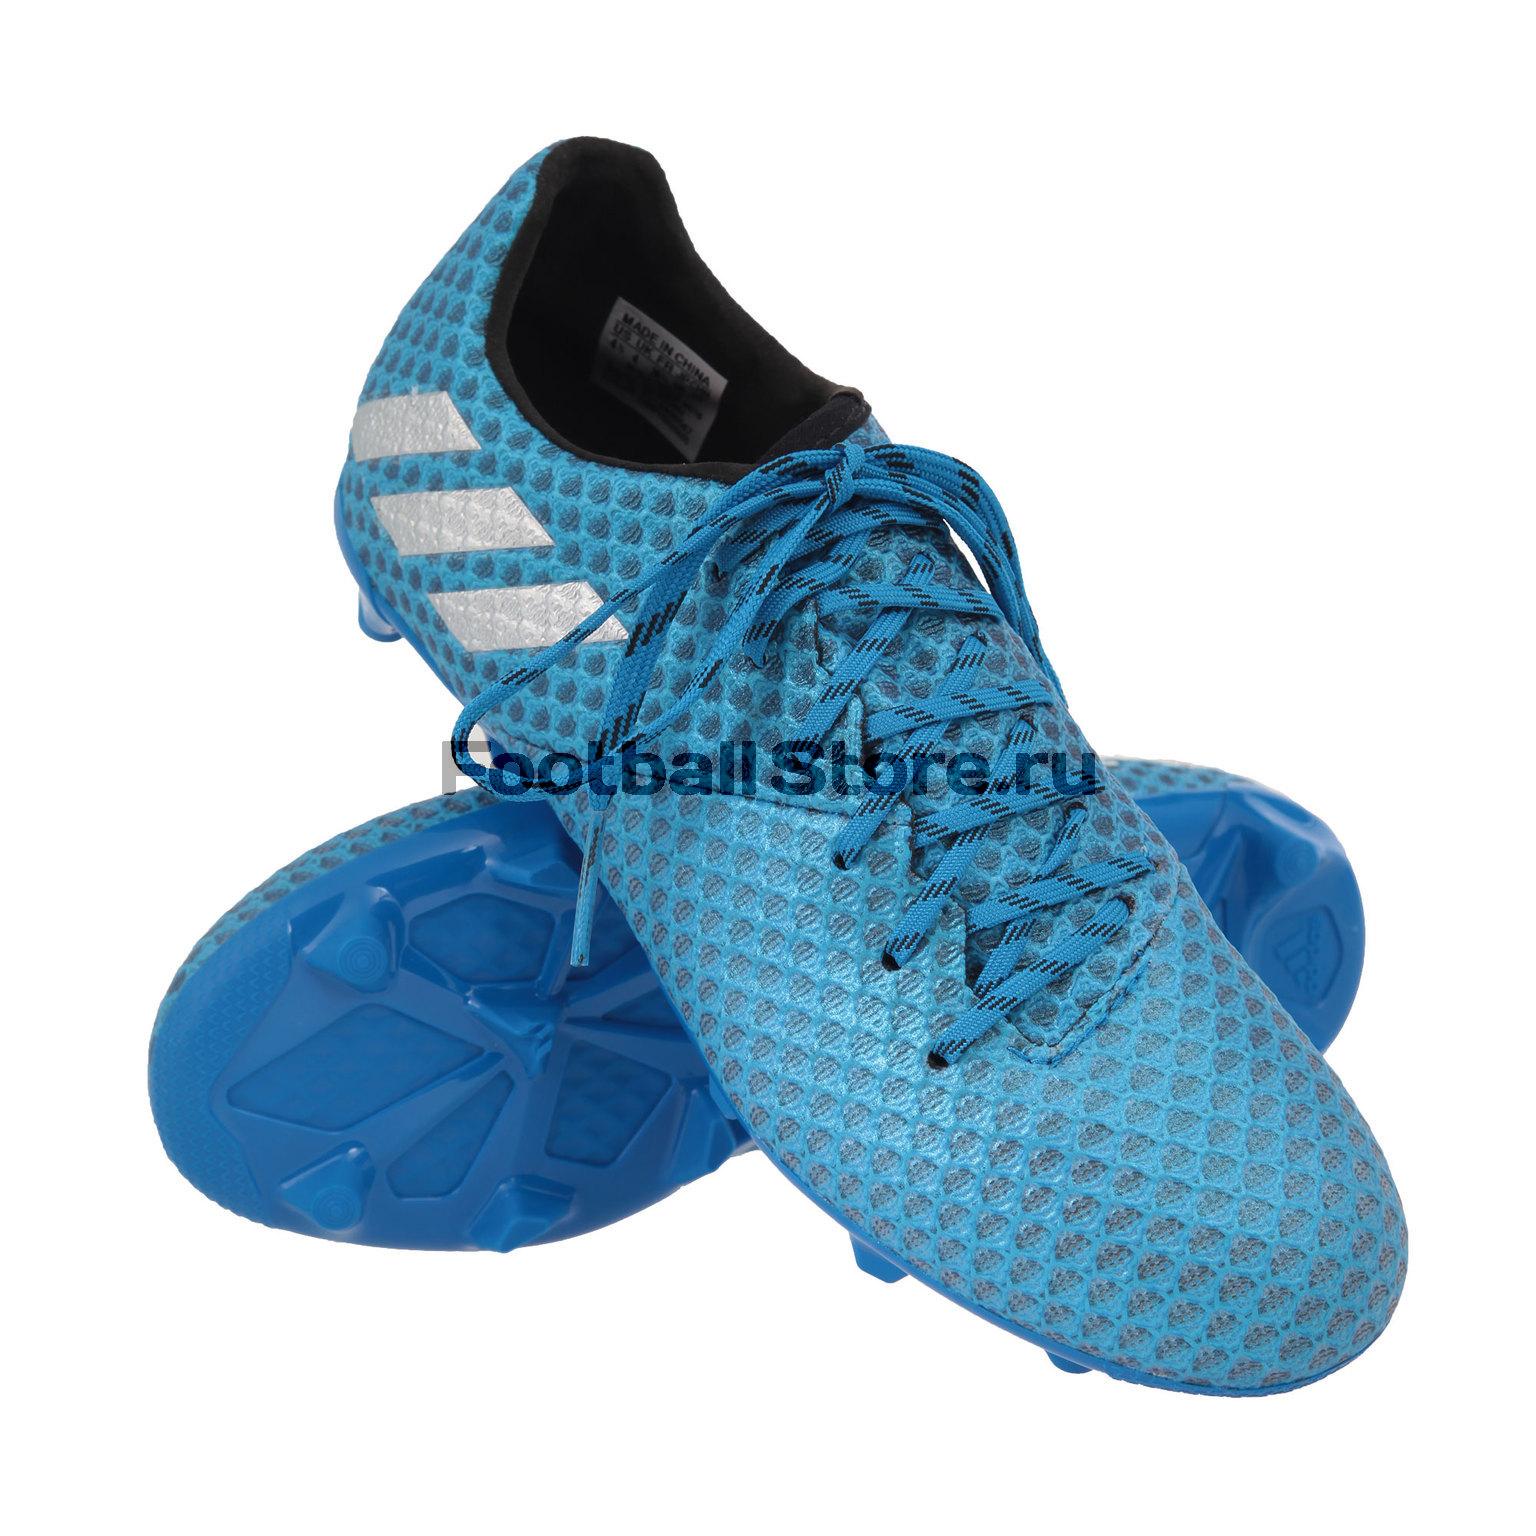 Бутсы Adidas Бутсы Adidas Messi 16.1 FG JR BB3852 adidas adidas messi 15 3 jr af4665